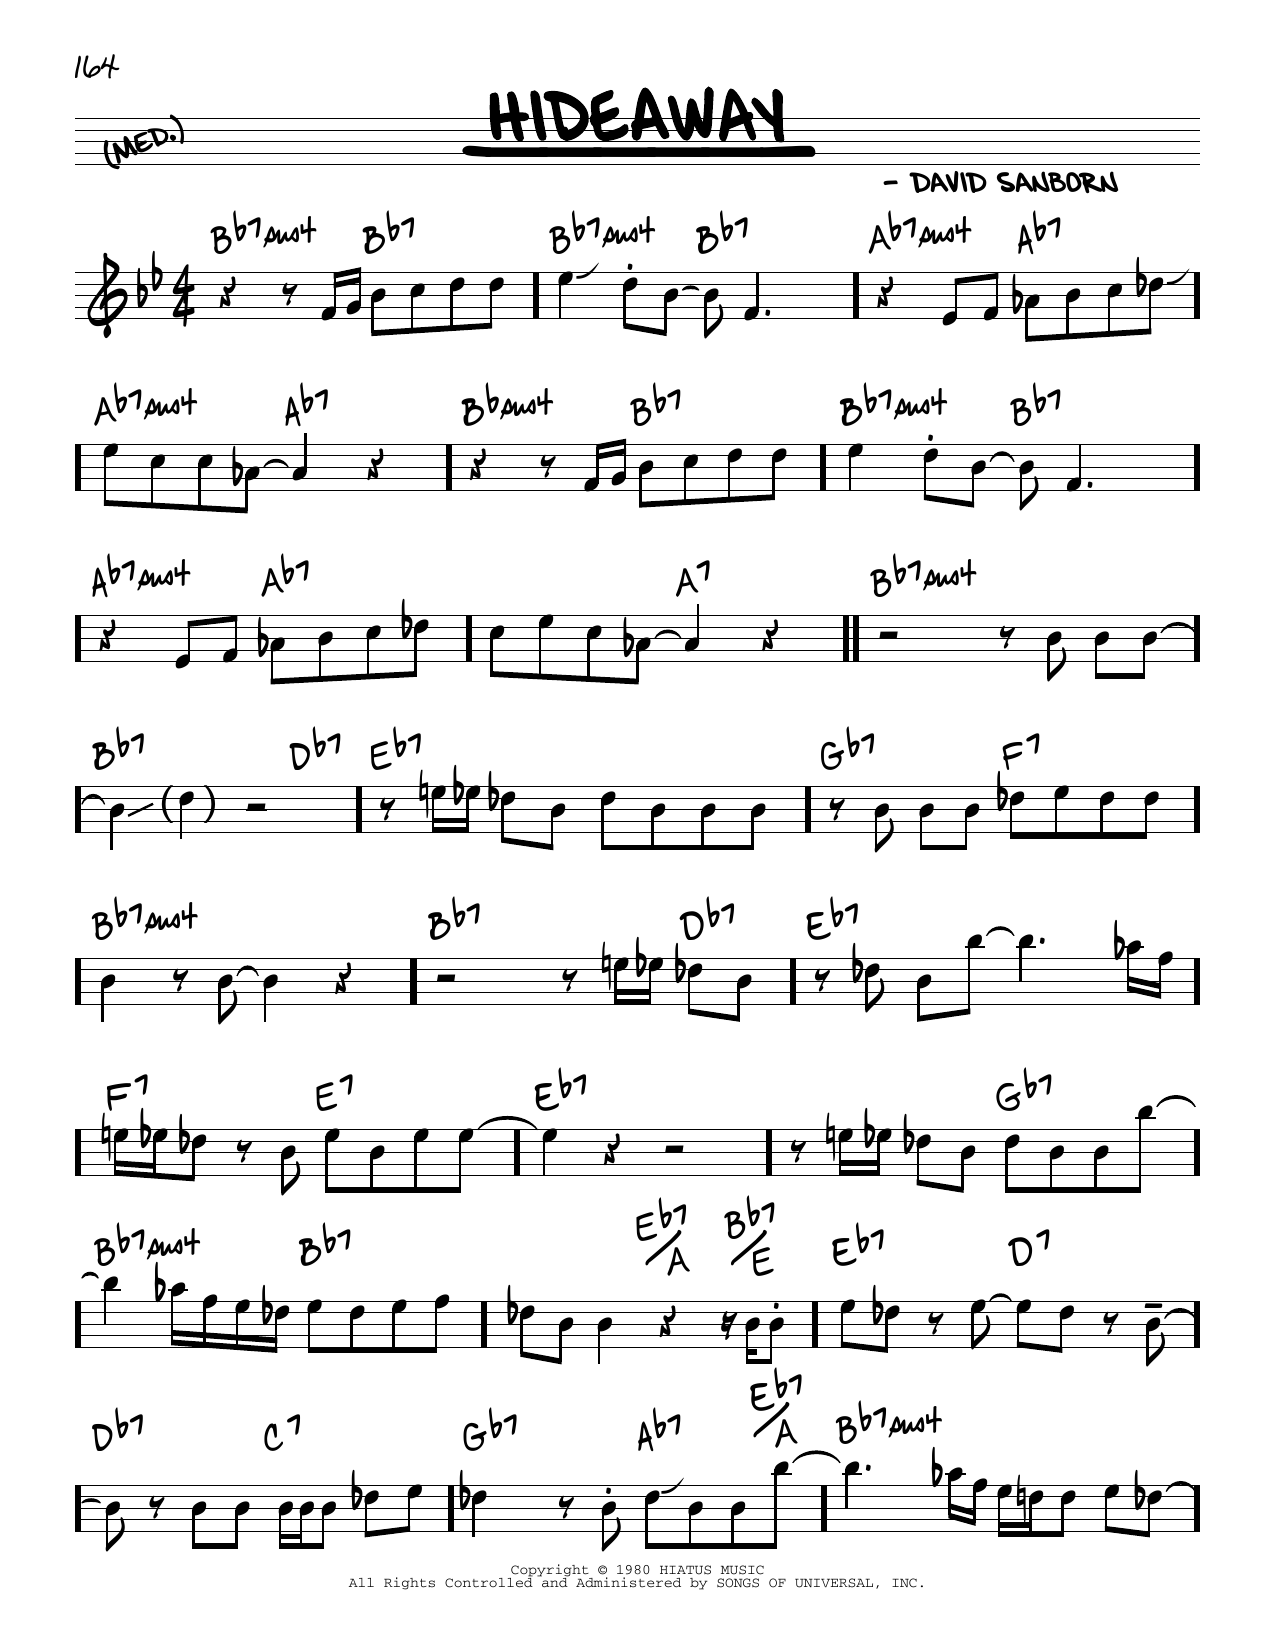 David Sanborn Hideaway sheet music notes and chords. Download Printable PDF.